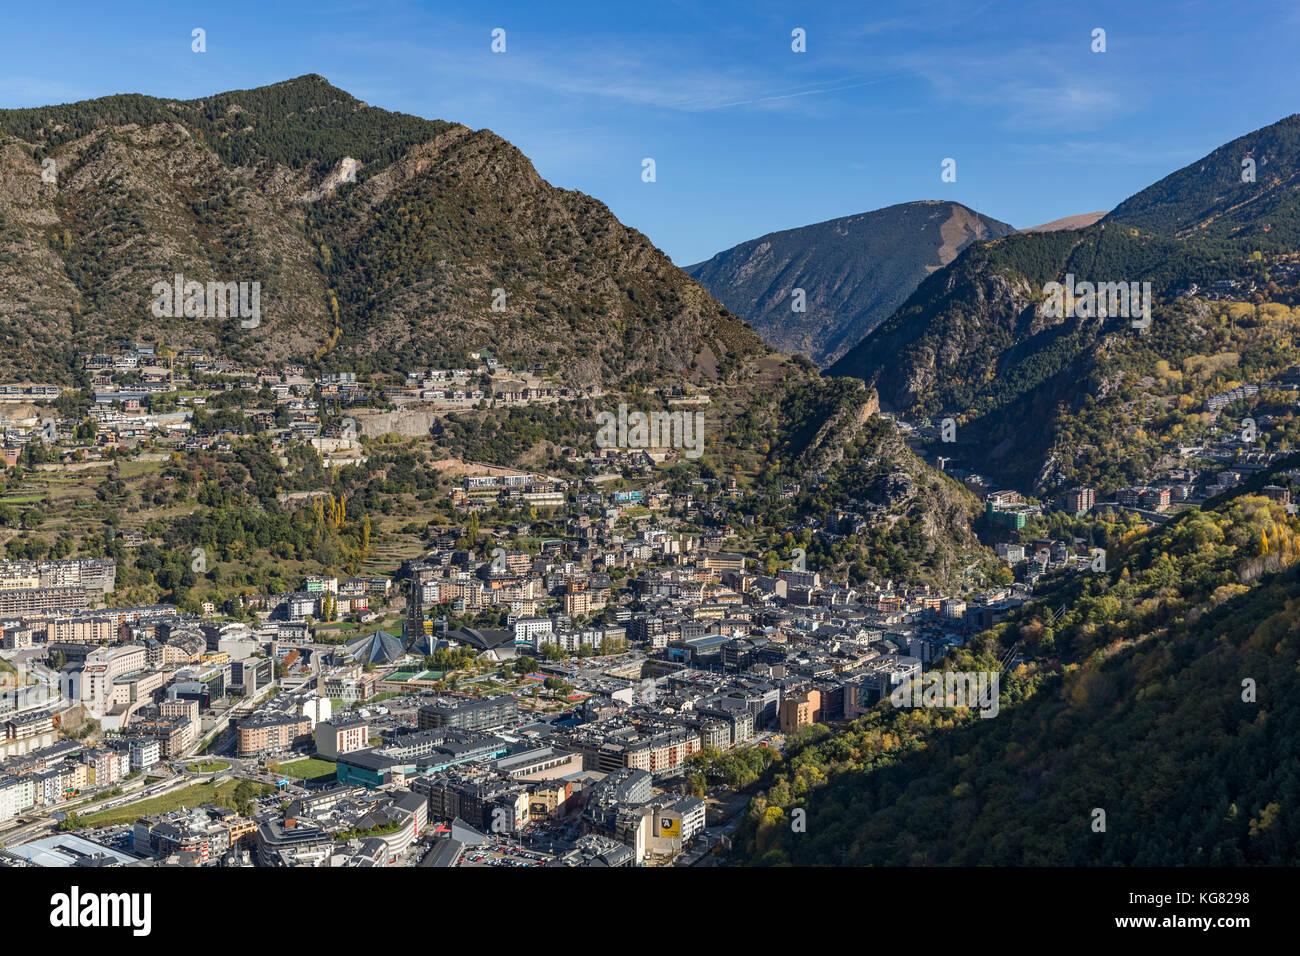 ANDORRA LA VELLA, ANDORRA - OCTOBER 28, 2017: Aerial view of Andorra la Vella, the capital of the Principality of - Stock Image